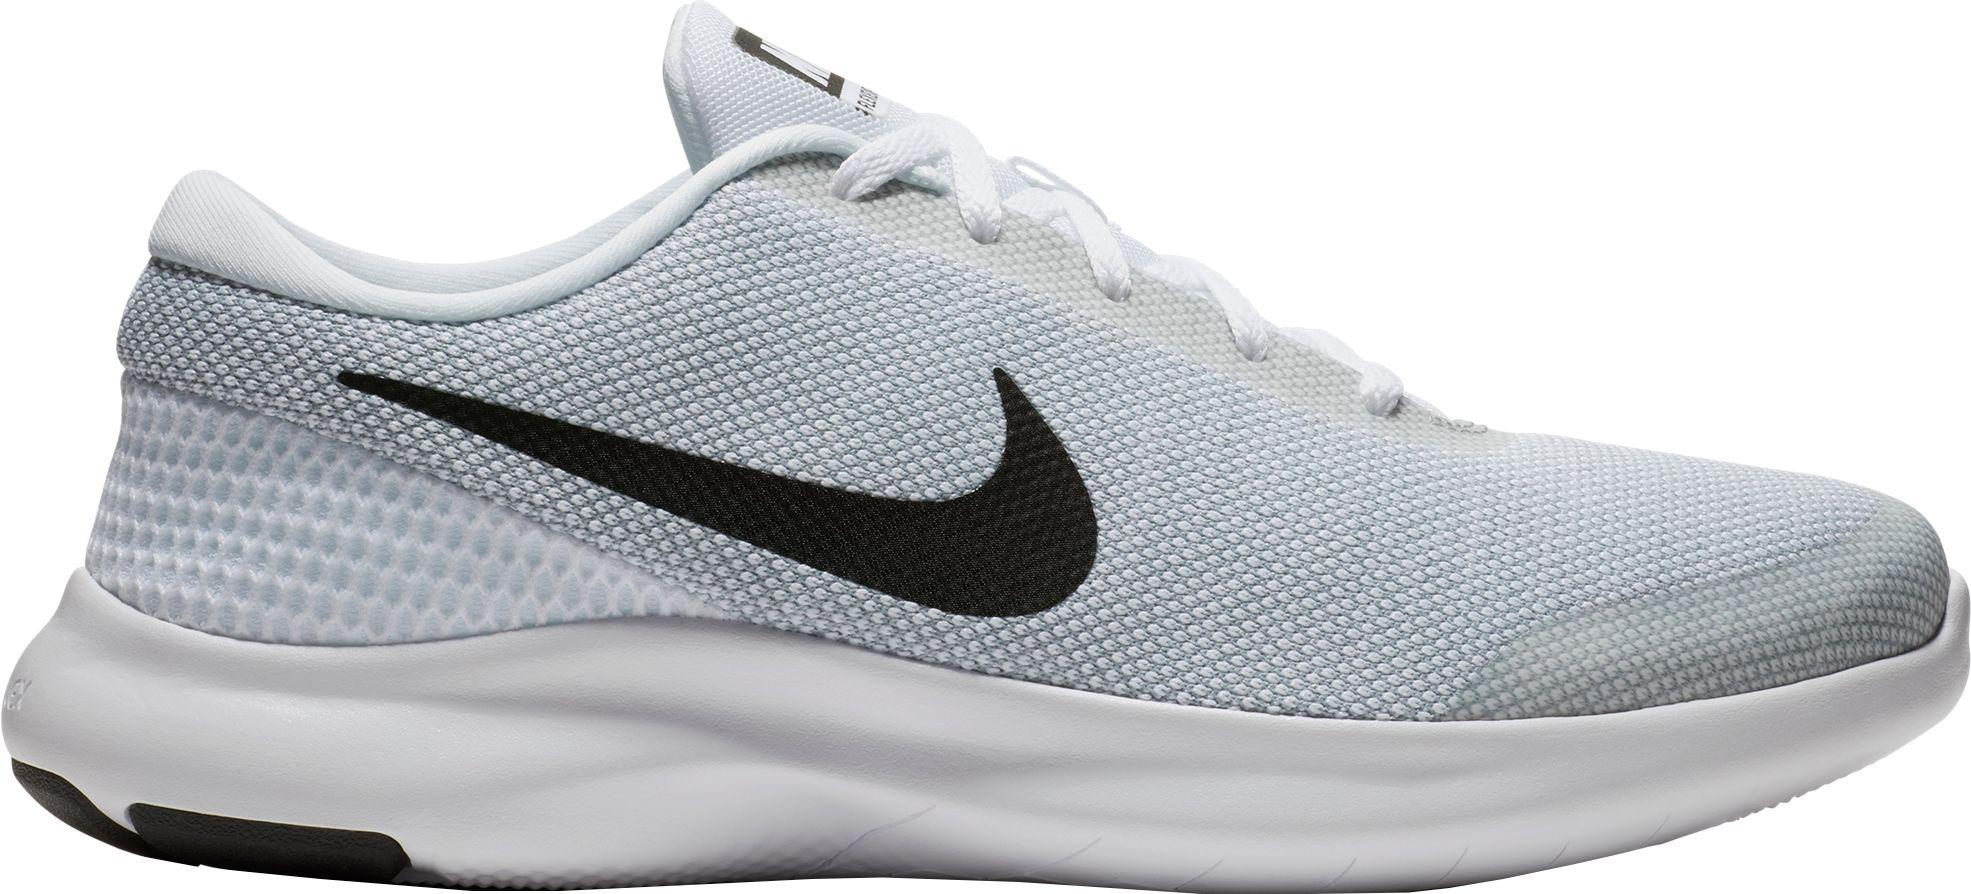 da70151cf0707 Nike Flex Experience Rn 7 Running Shoes in Gray for Men - Lyst